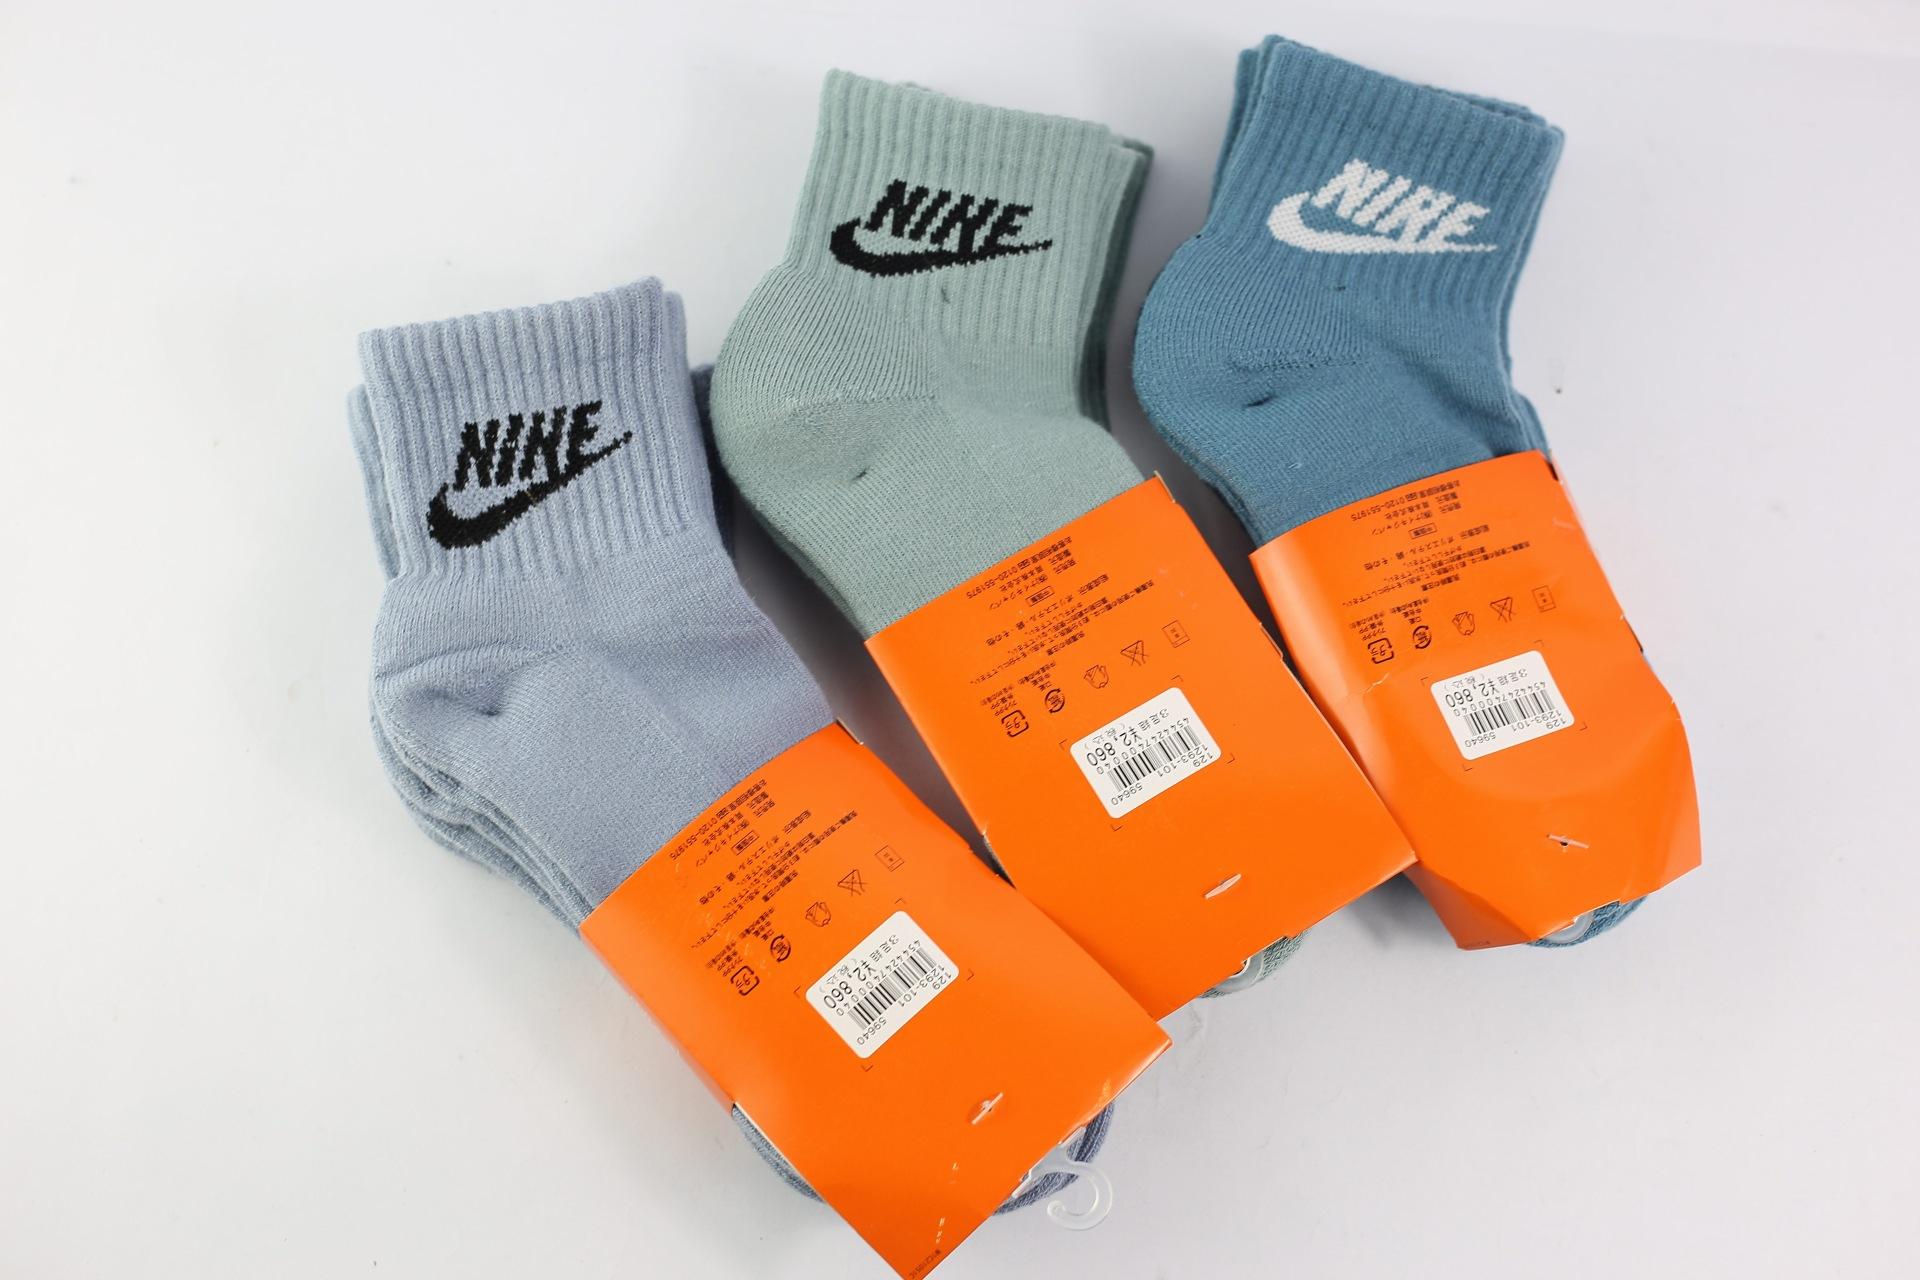 tat-the-thao-co-trung-nike-mid-socks-1293-m-hang-chinh-hang